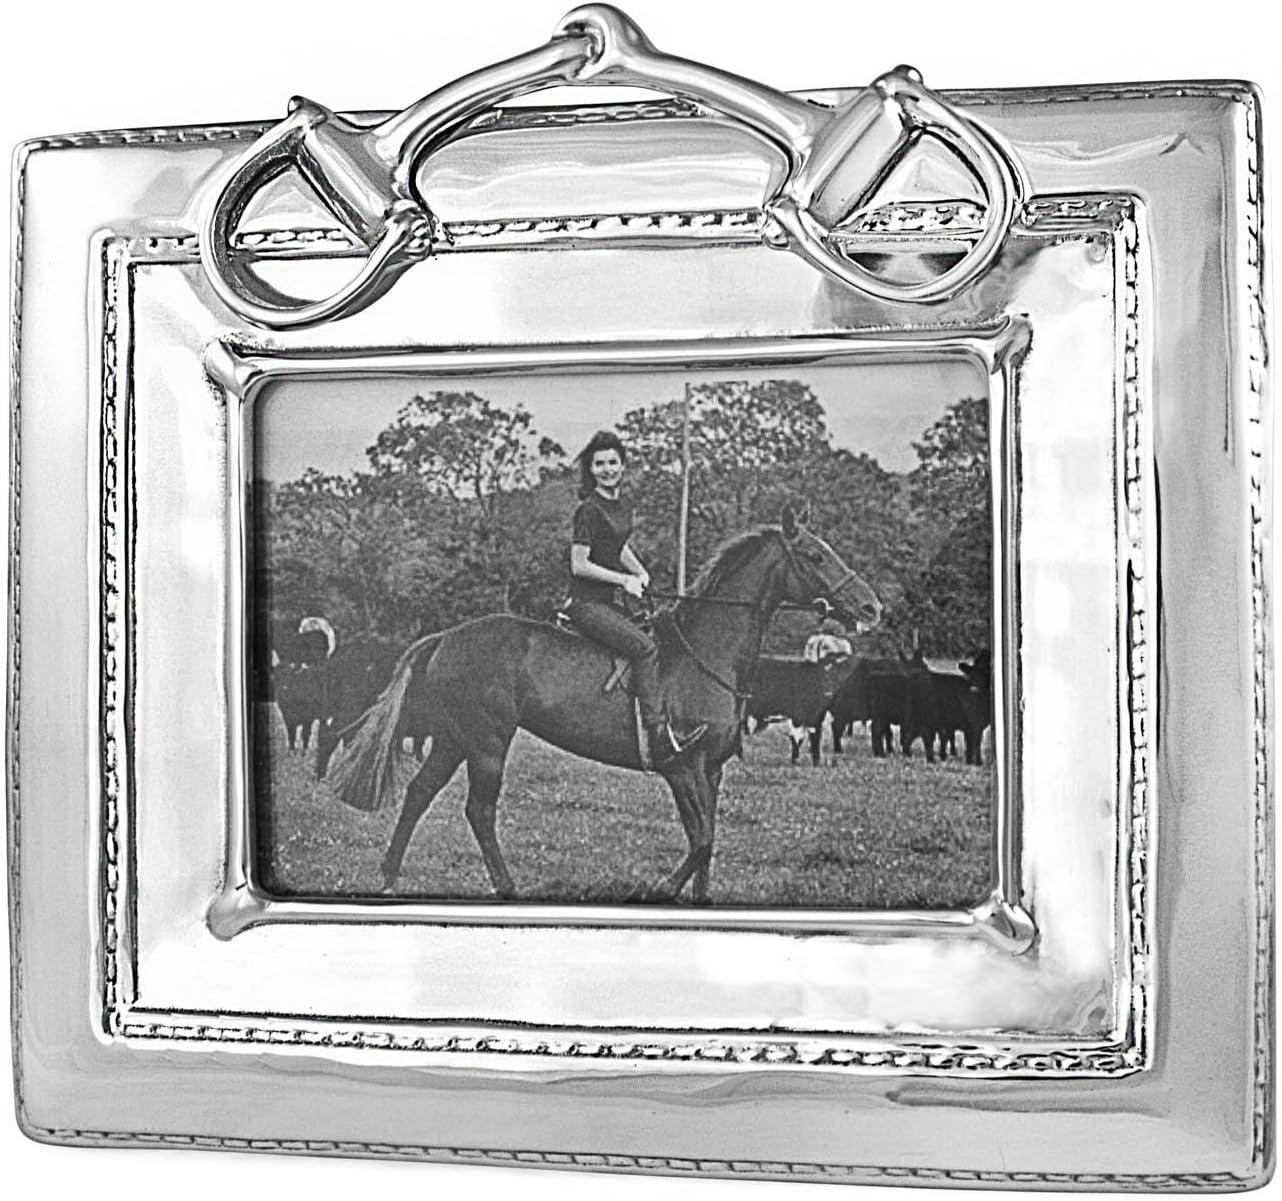 Beatriz Ball Equestrian Snaffle Bit 5X7 Frame